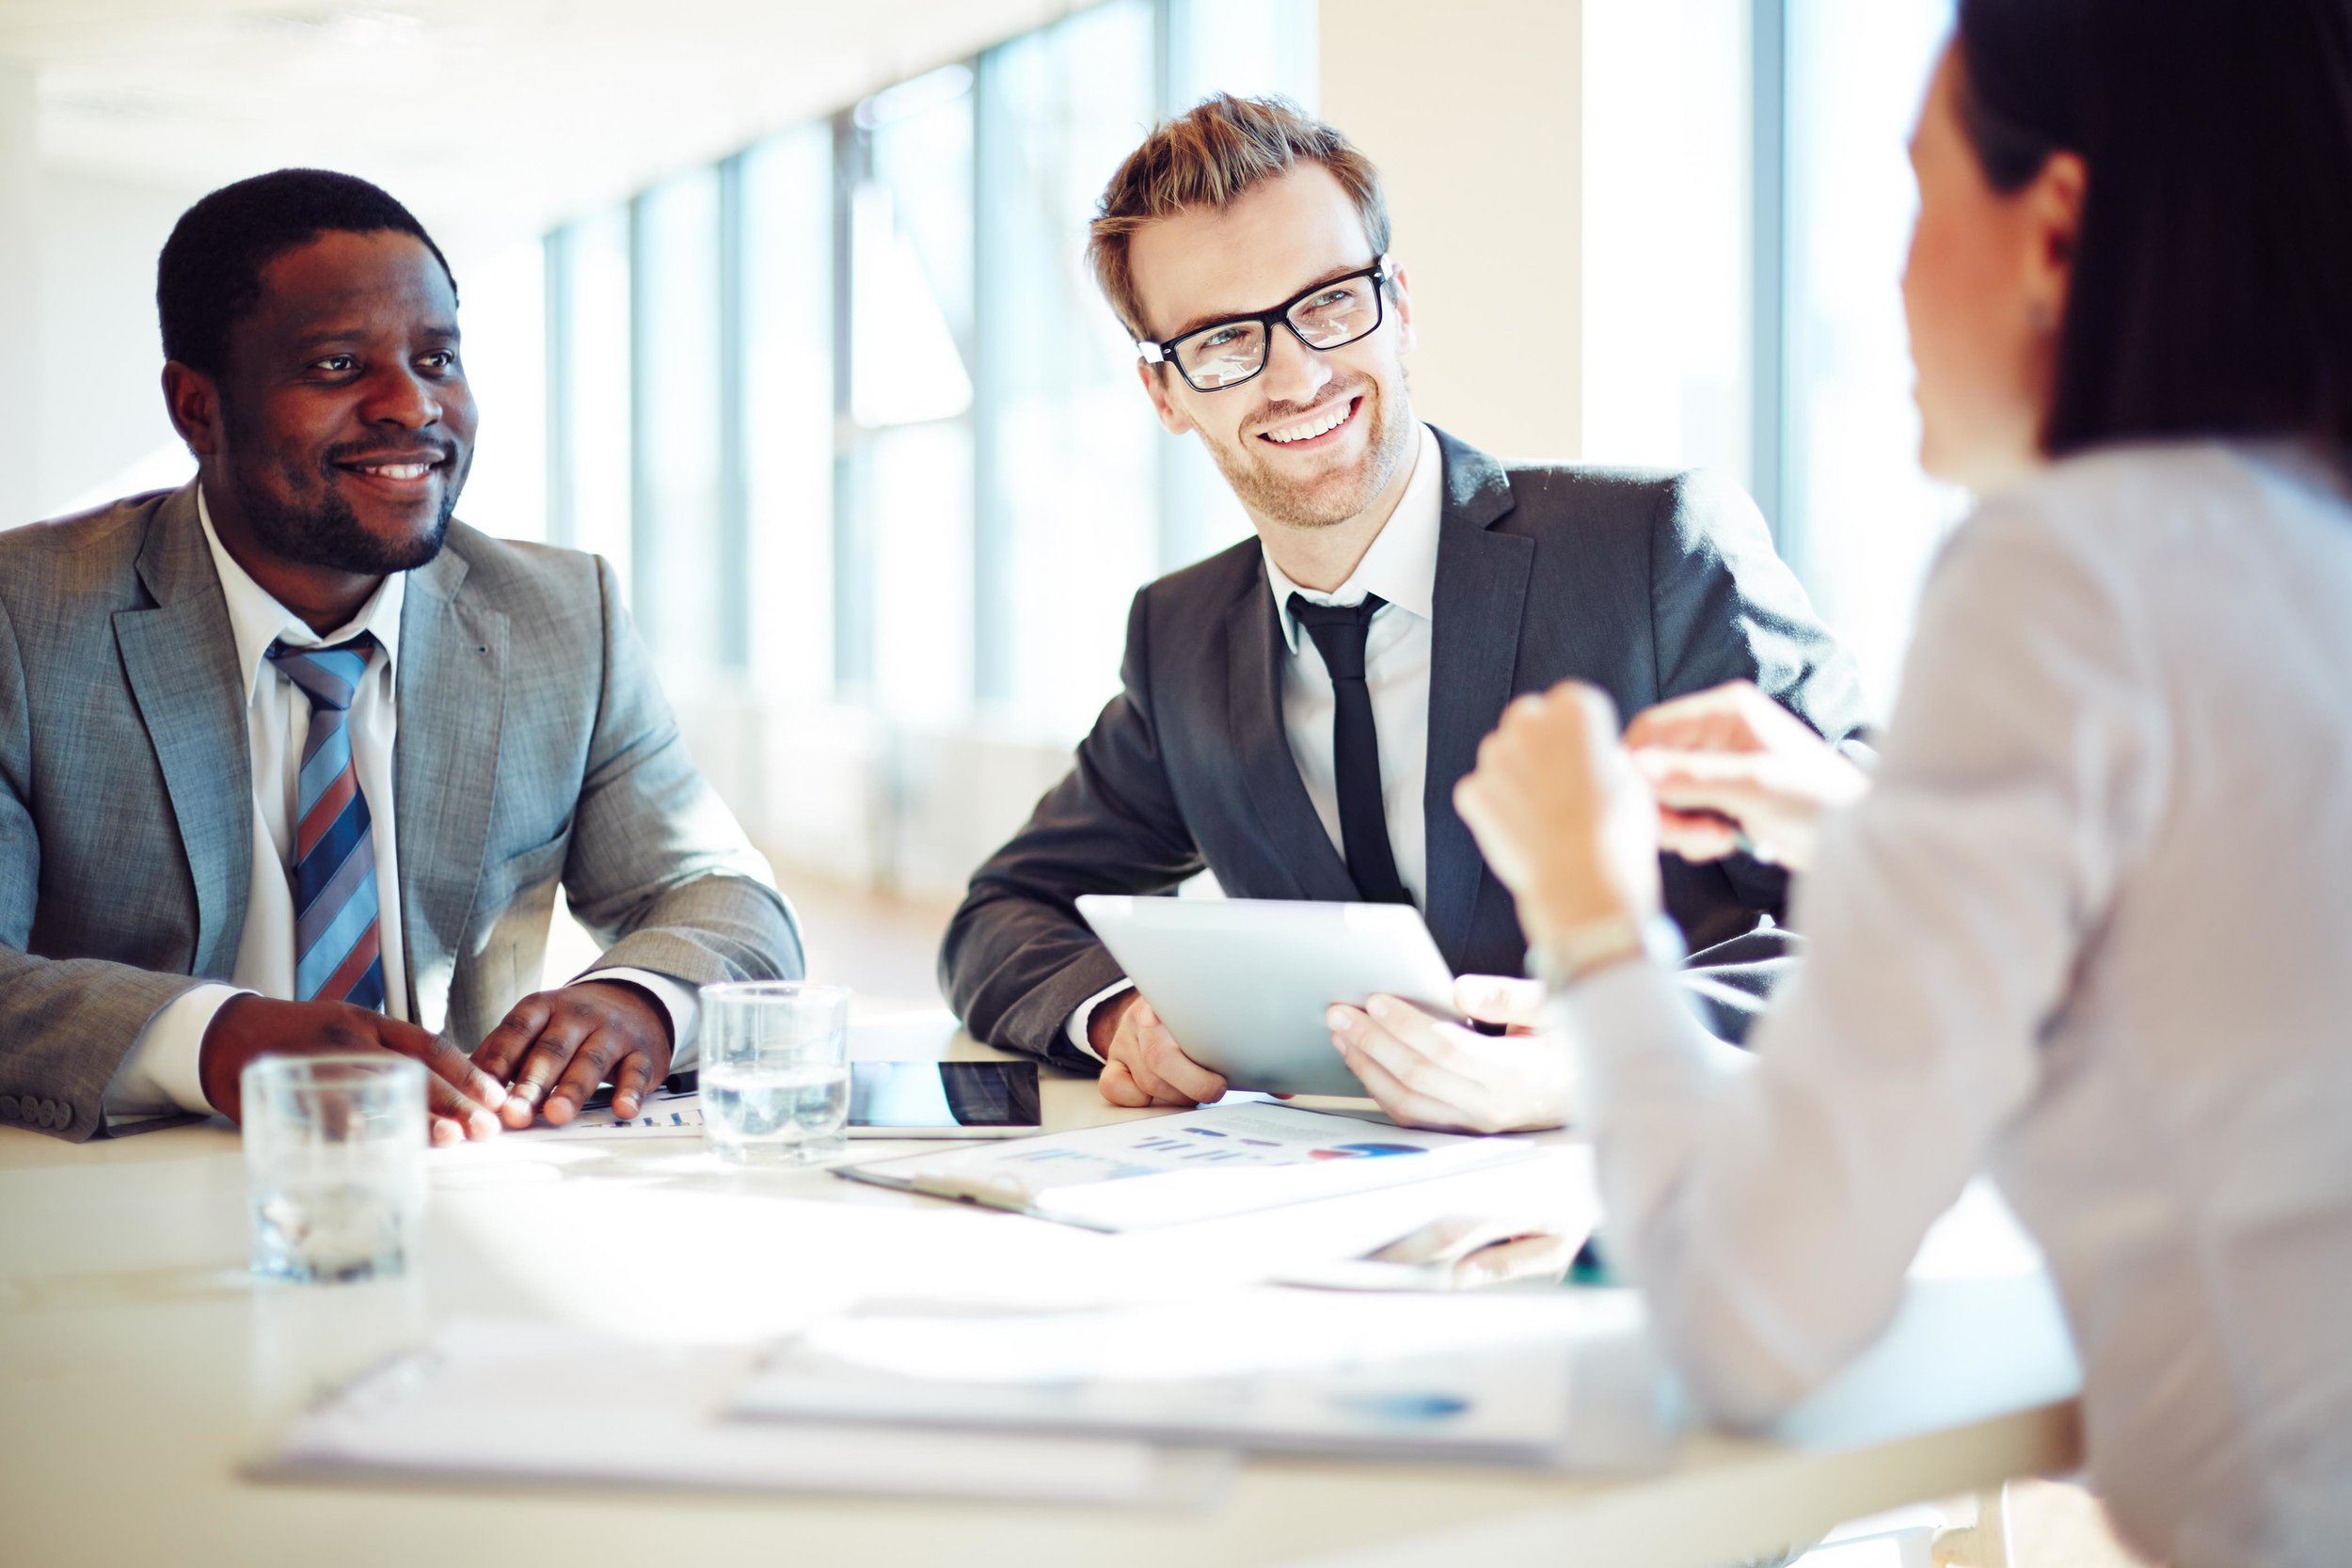 JOB INTERVIEW - Eres un profesional que está buscando aplicar a empresas multinacionales donde vas a tener entrevistas en inglés? o quieres aplicar a empresas en países anglosajones en las cuales vas a tener estas entrevistas?